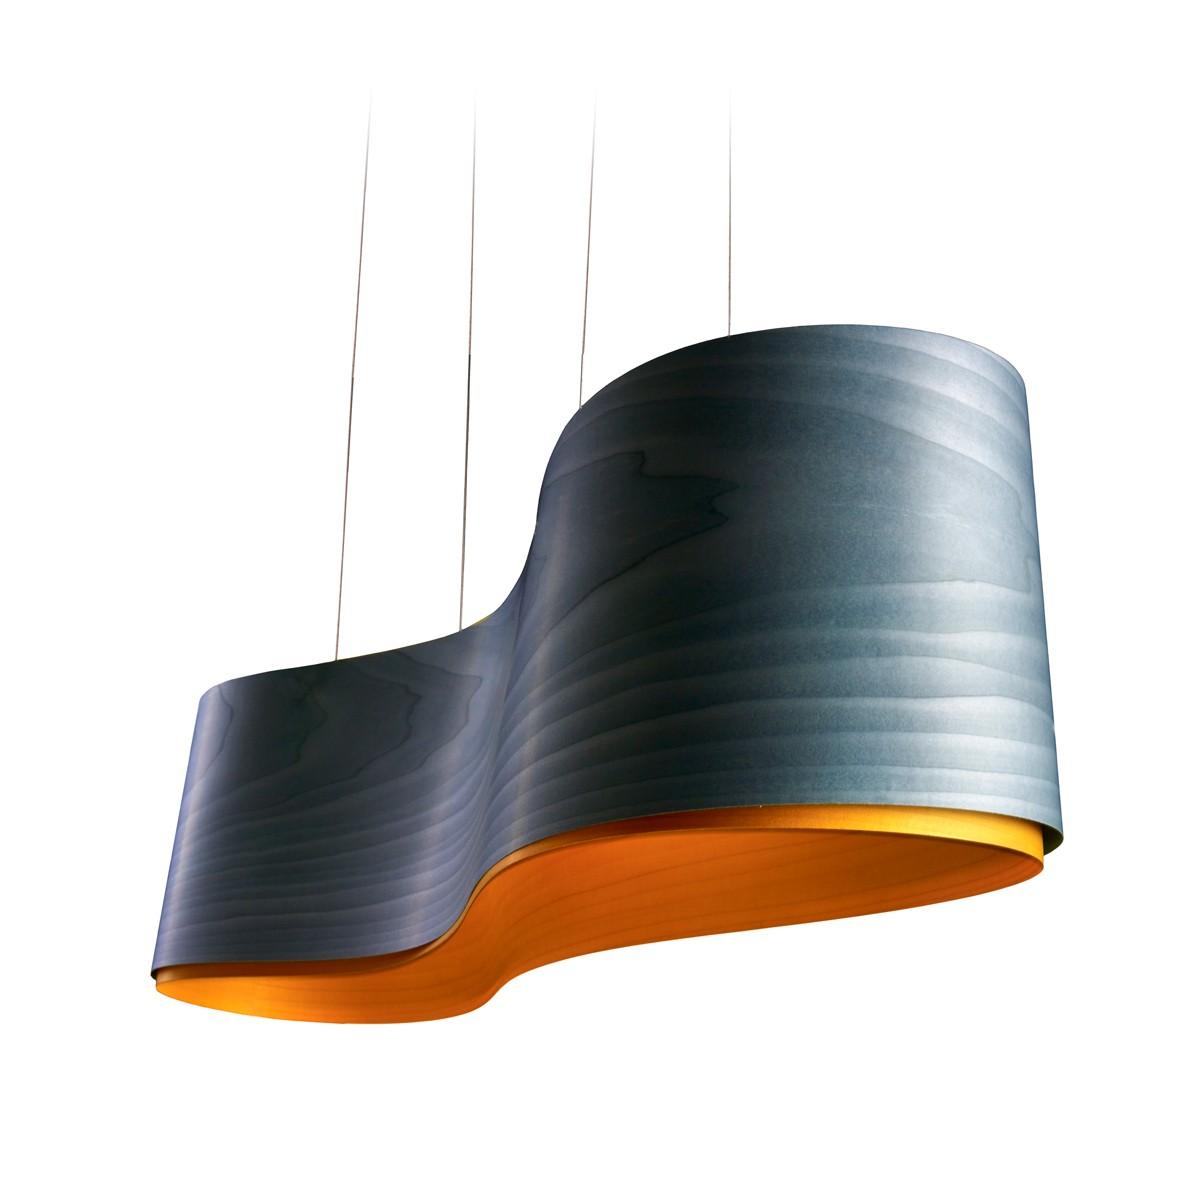 LZF Lamps New Wave Pendelleuchte, blau, innen: gelb